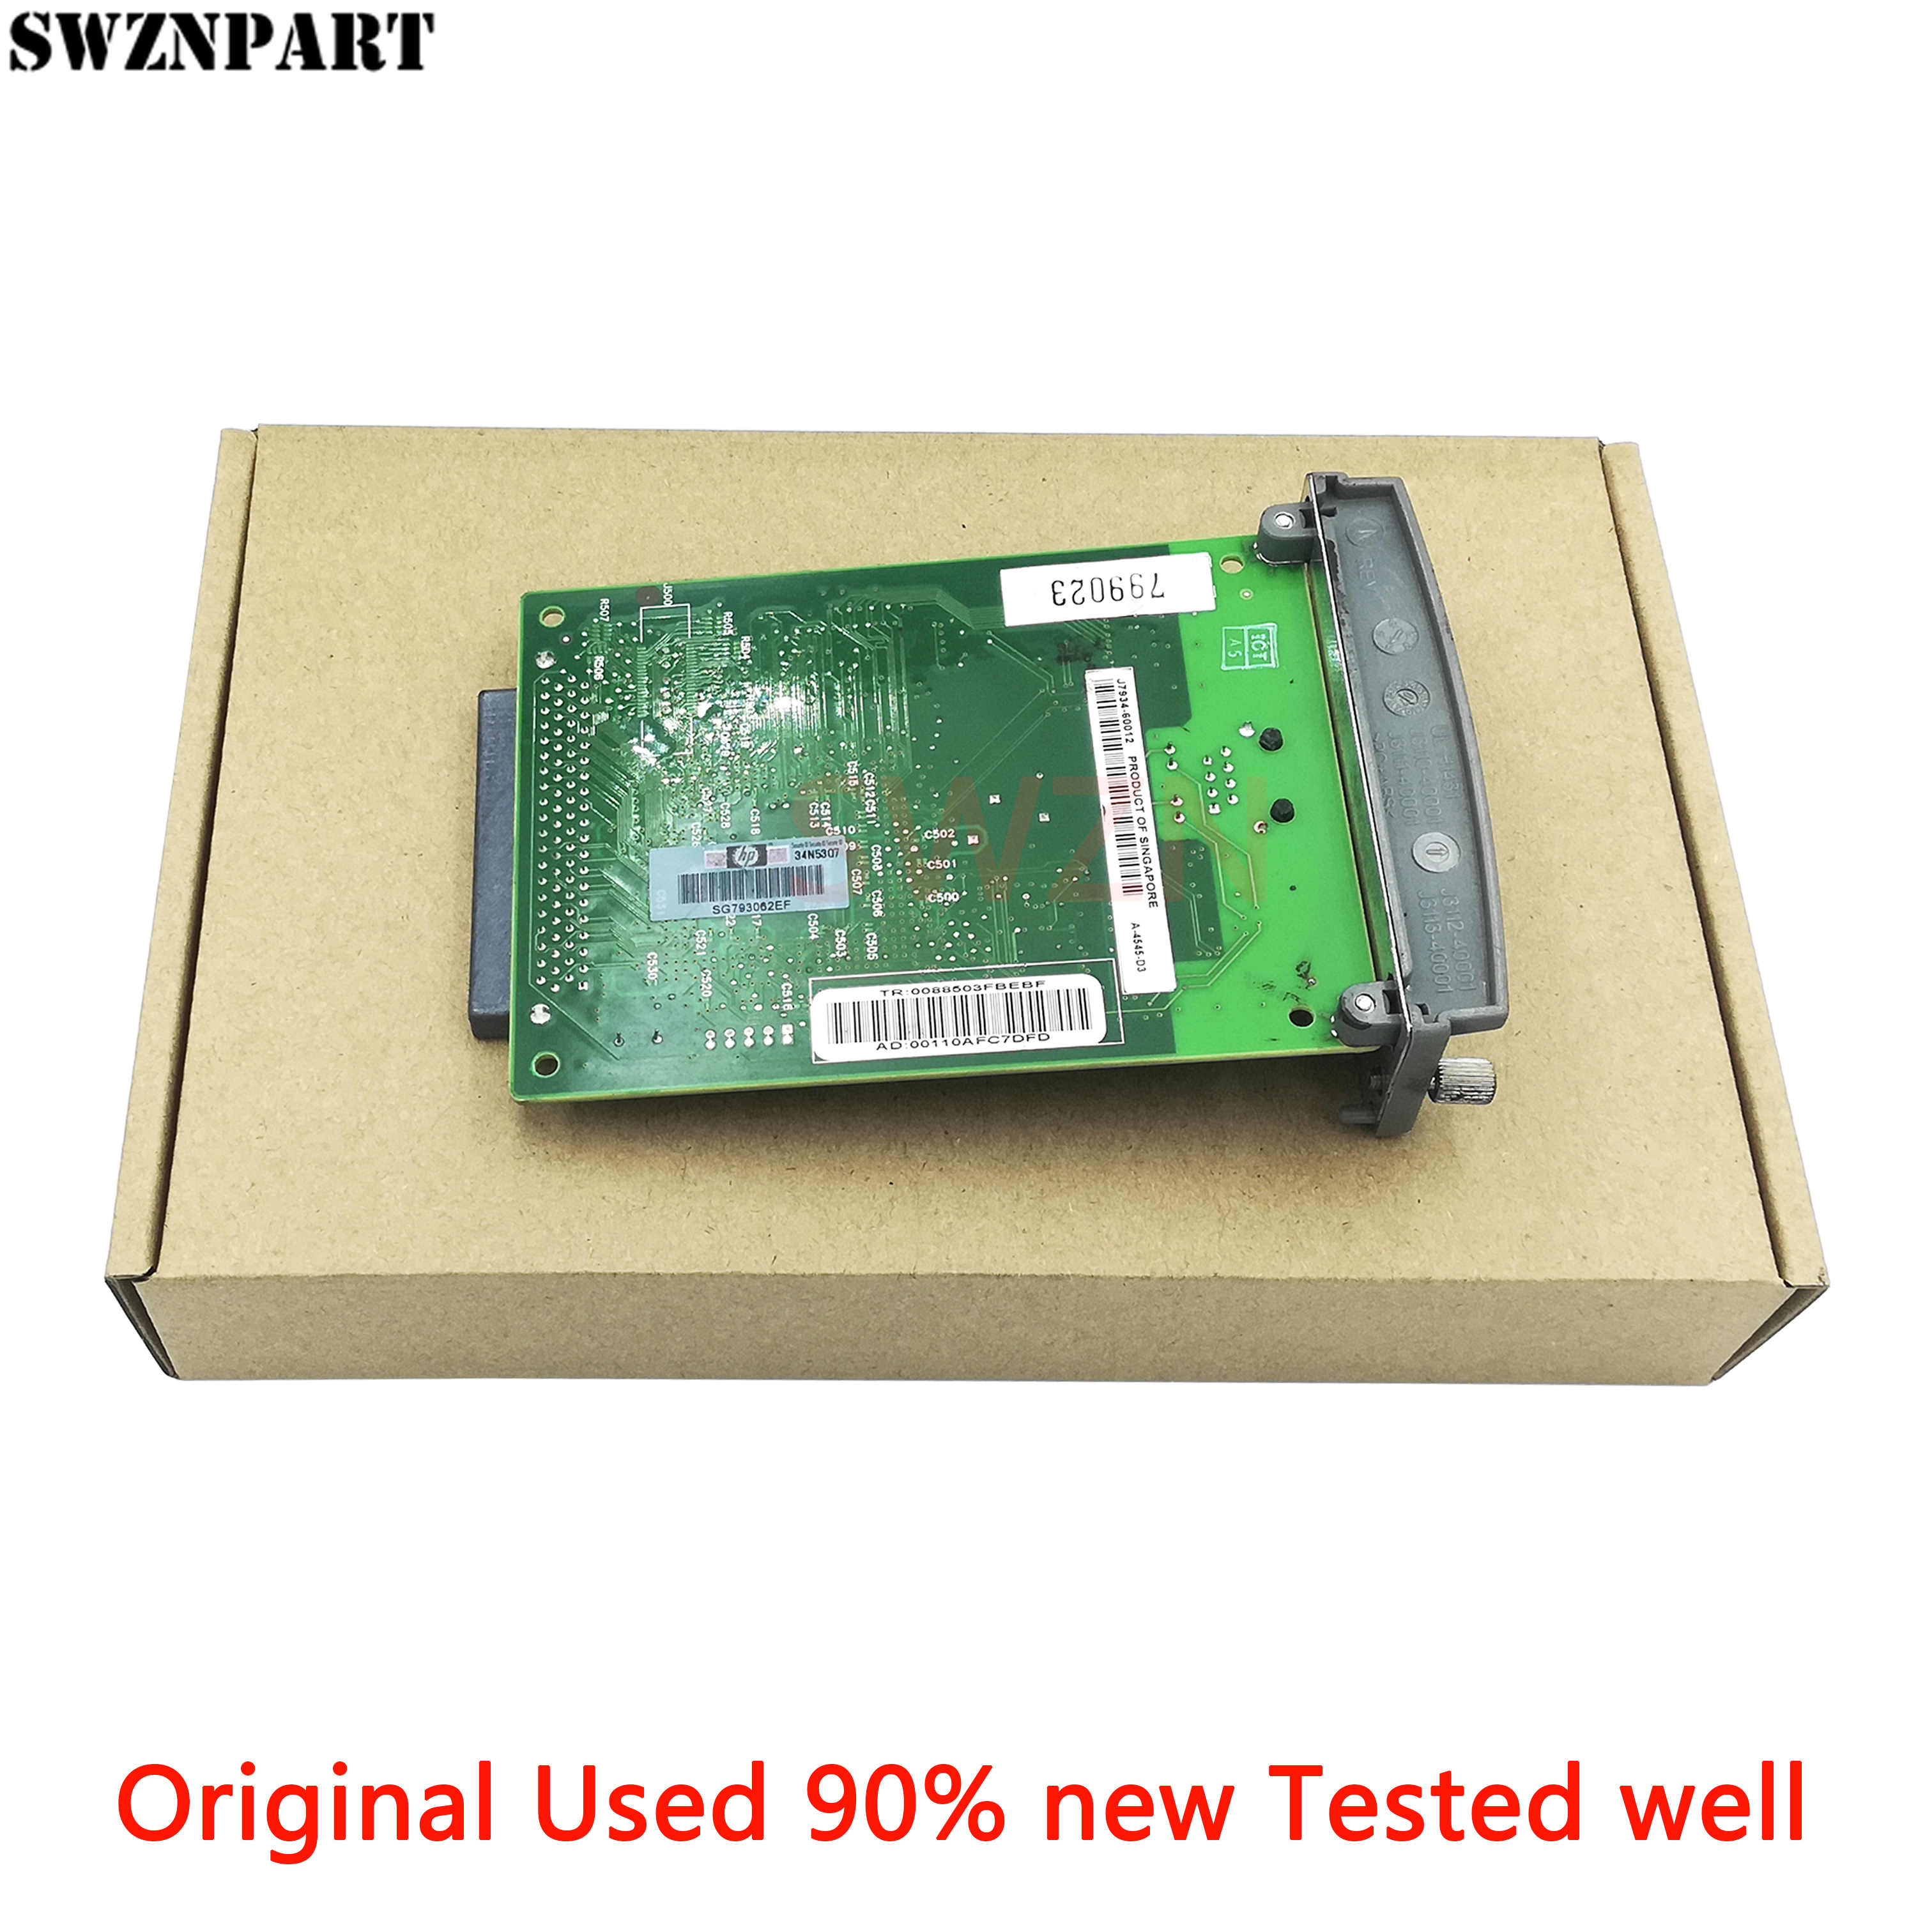 Ethernet Print Server Internal Kartu Jaringan untuk HP Jetdirect 620N J7934A J7934G 4200 4250 5500 5550 3005 5200 2100 2200 2400 500